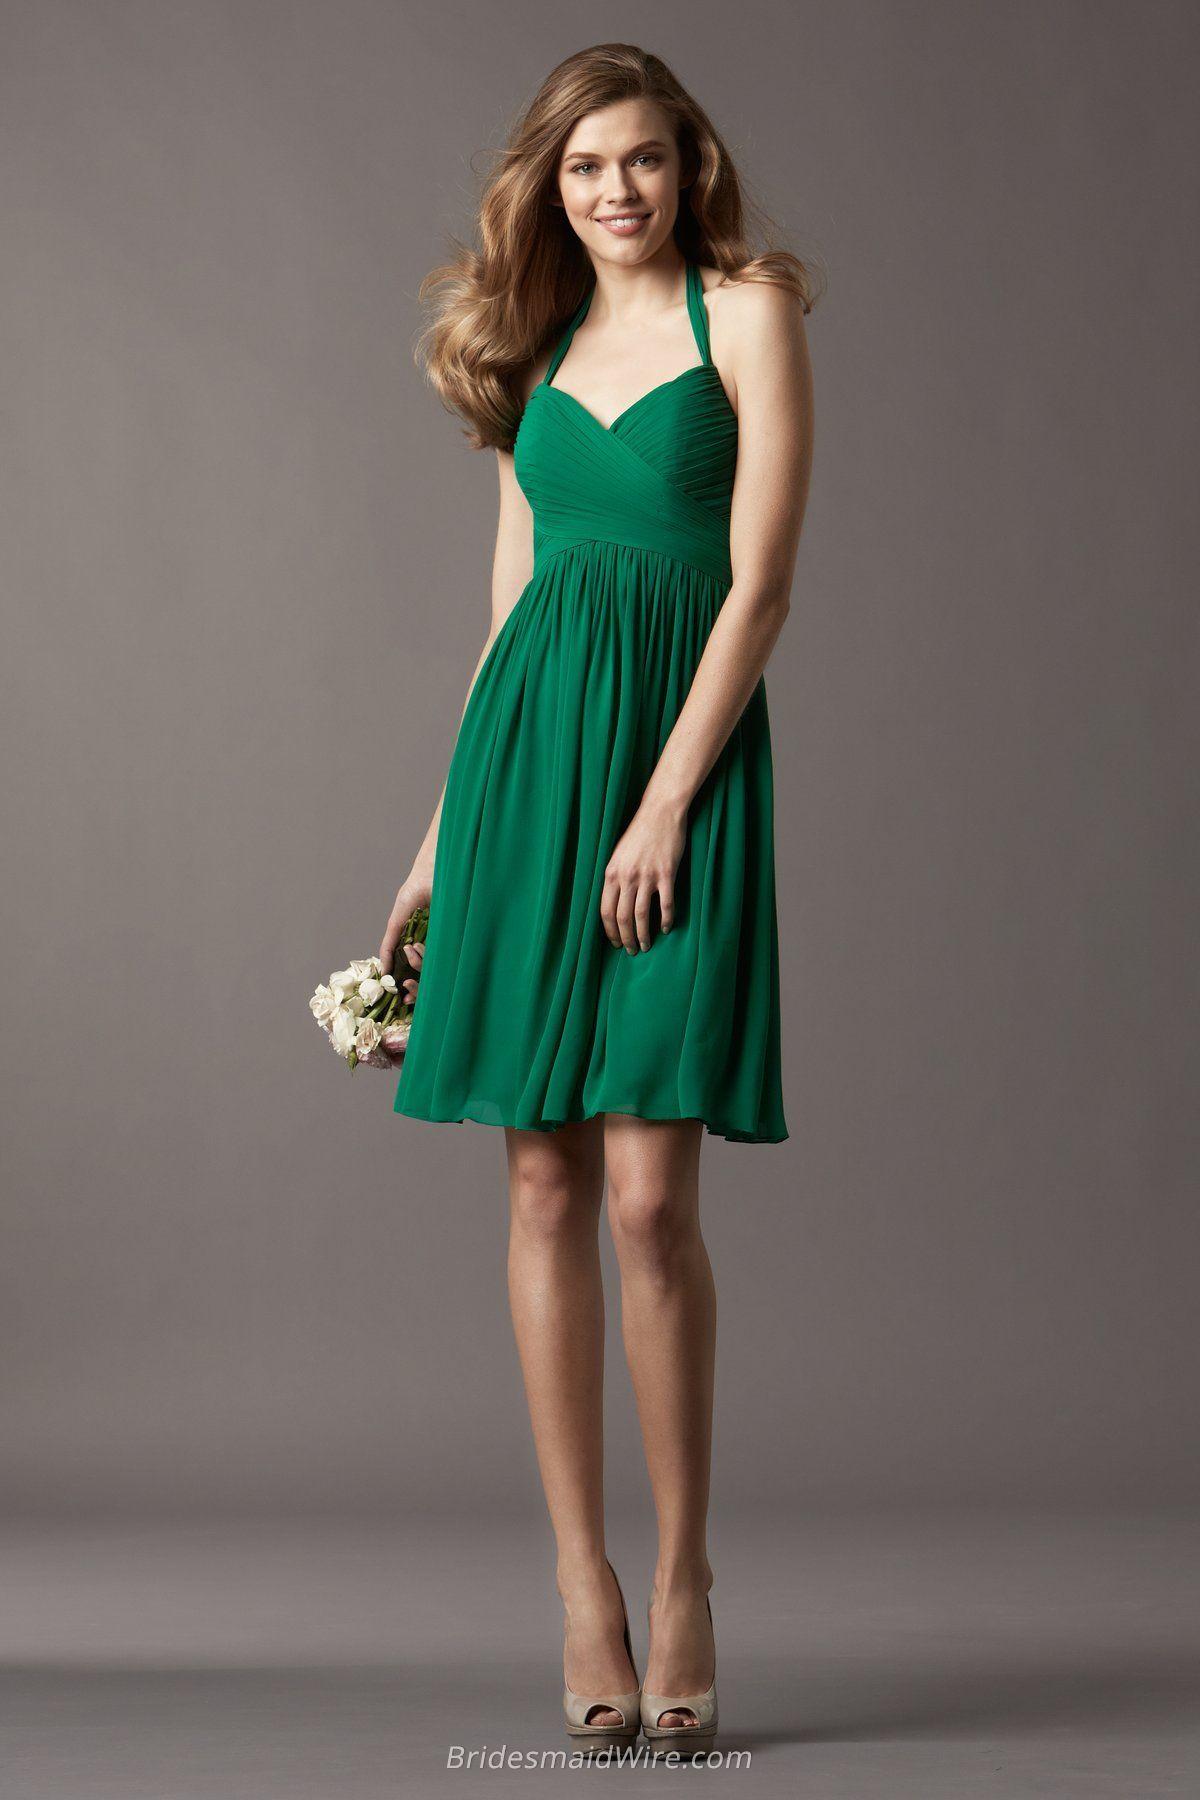 Trendy Green Chiffon Halter Sweetheart A Line Short Bridesmaid Dress